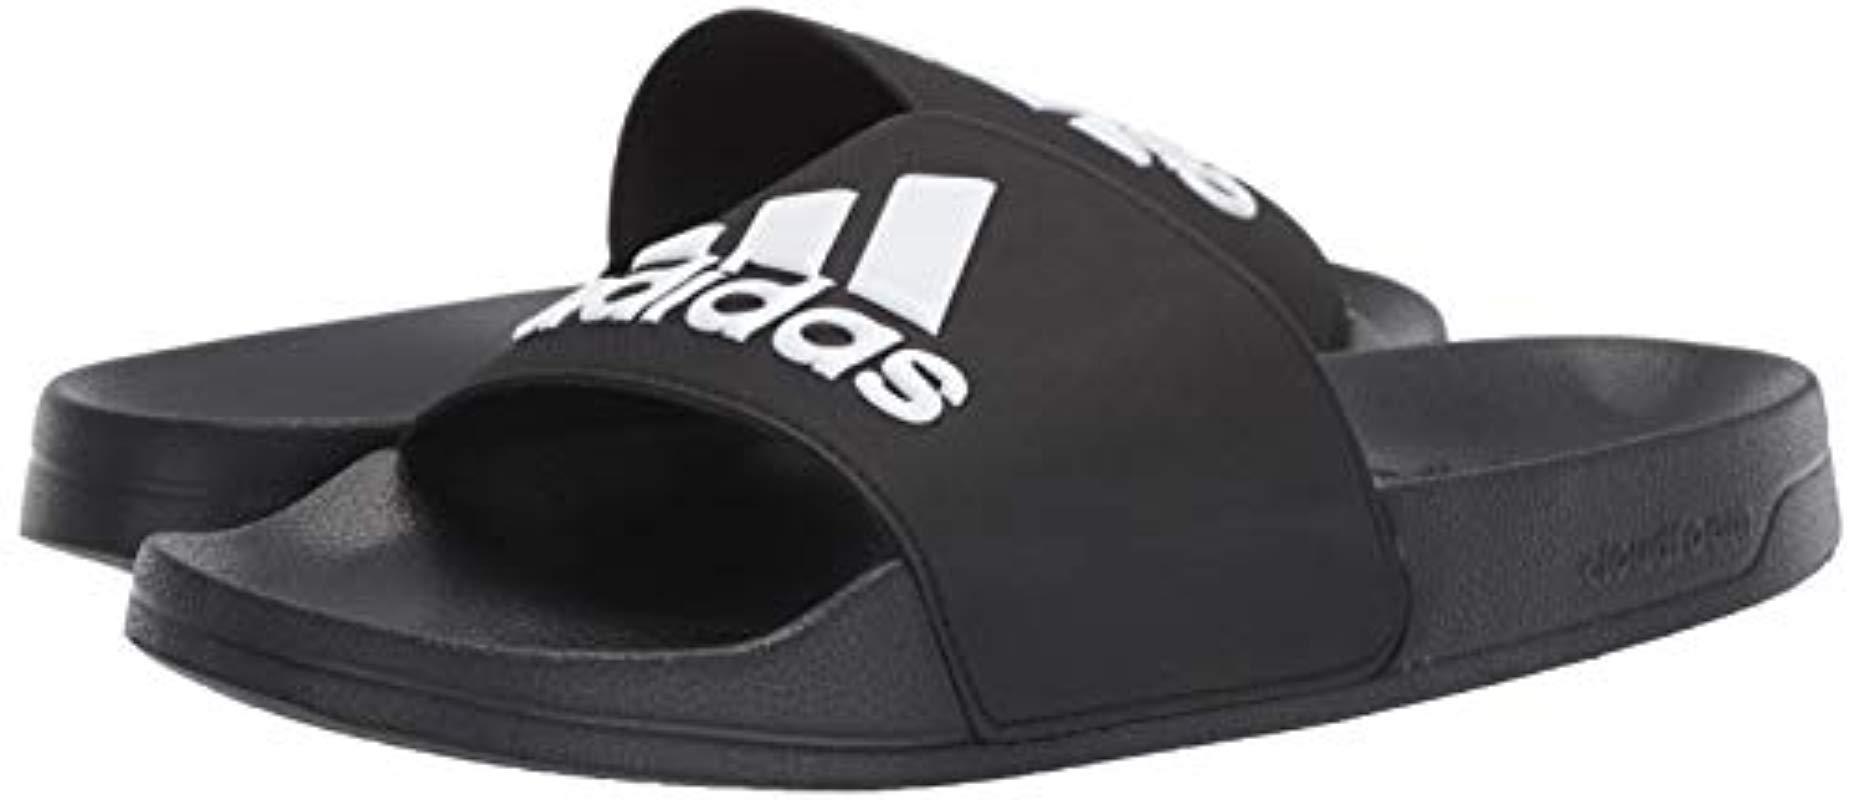 predominante sensación cómoda buena venta adidas Synthetic Adilette Shower Black/white/black Sandals (f34770 ...